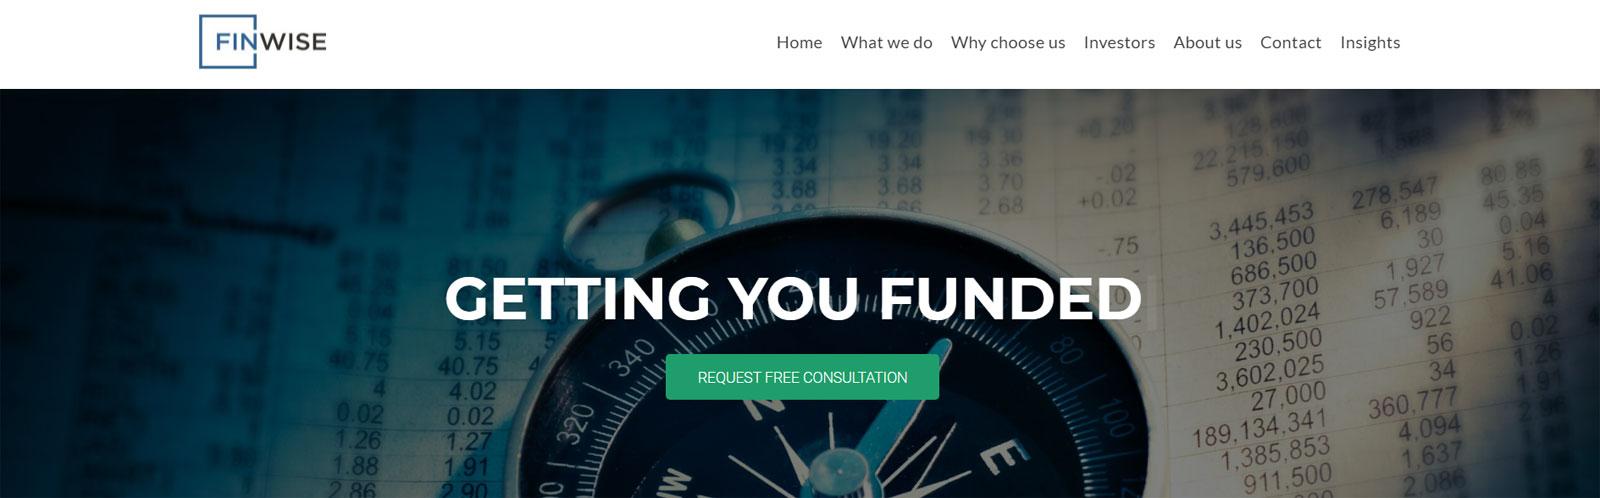 Sold over $4k in November, Finwise.com lost in UDRP